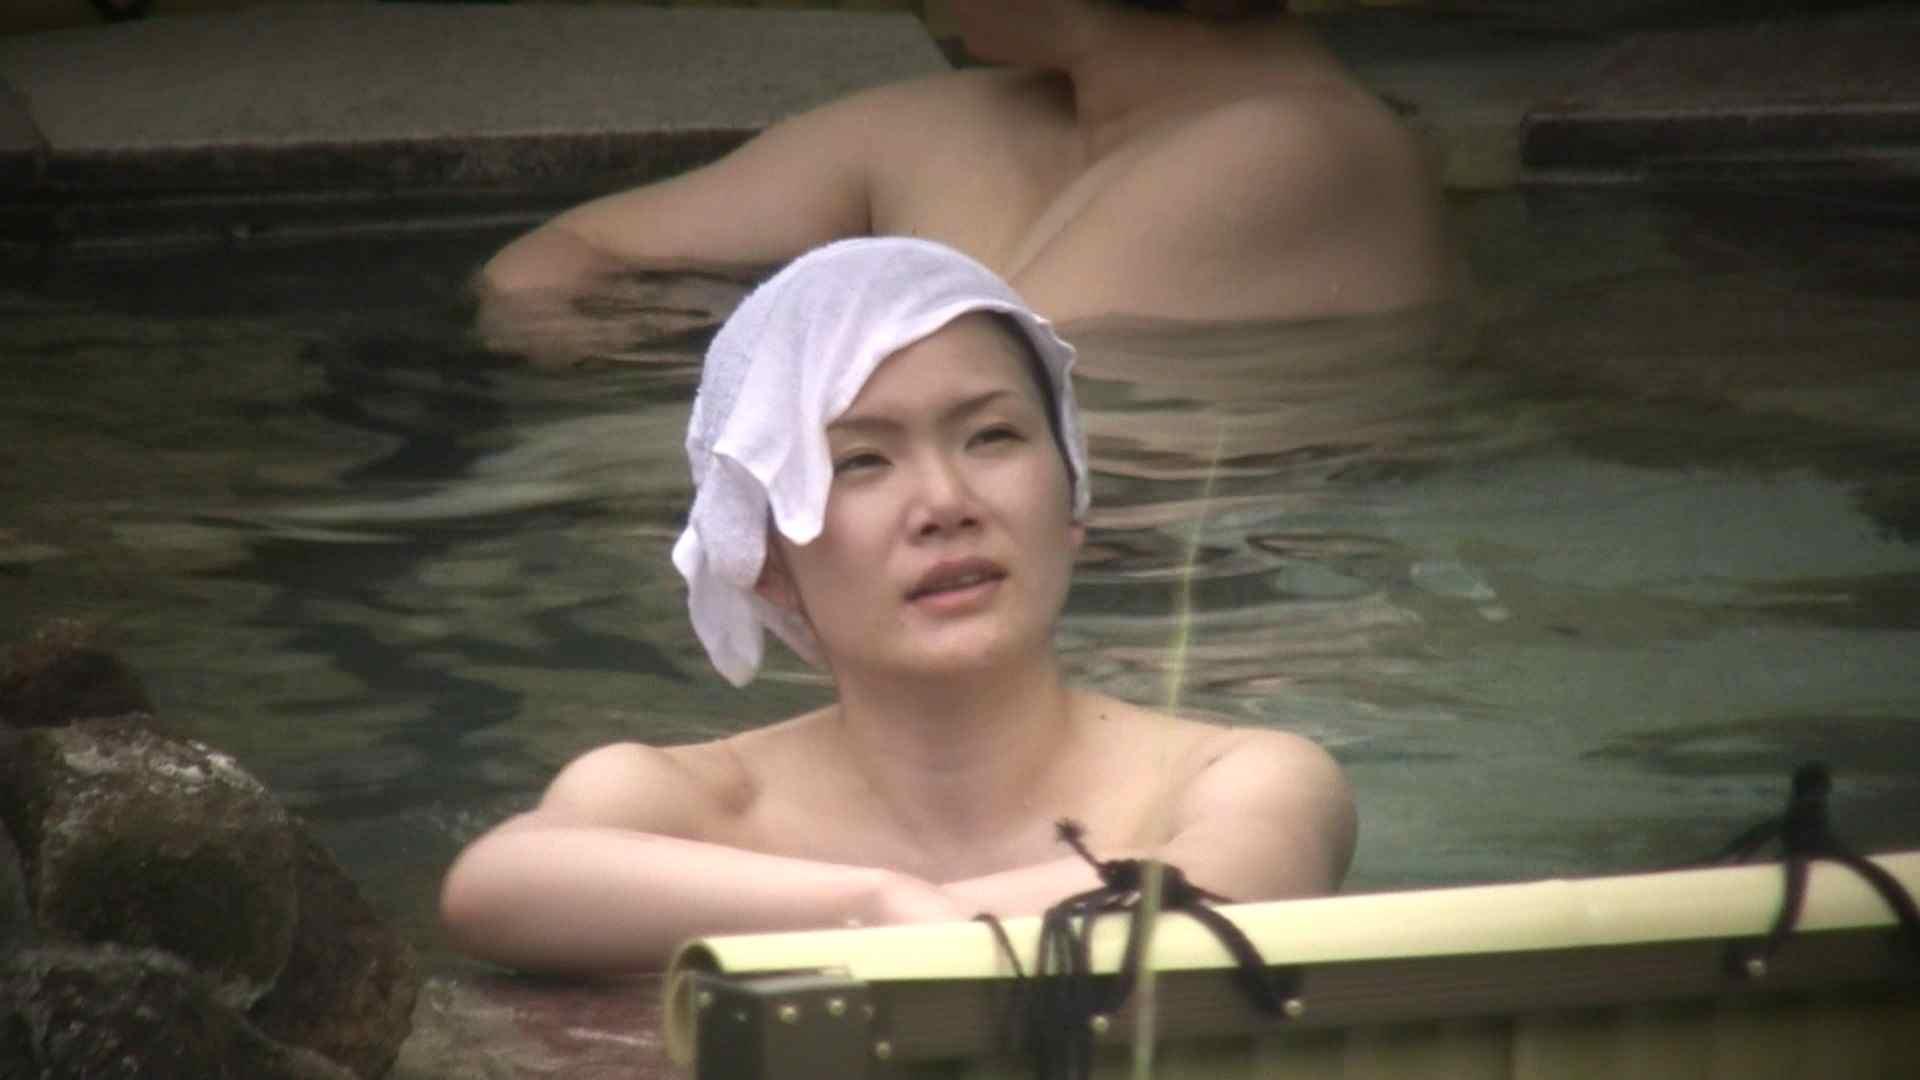 Aquaな露天風呂Vol.12【VIP】 綺麗なOLたち | 盗撮  84枚 4